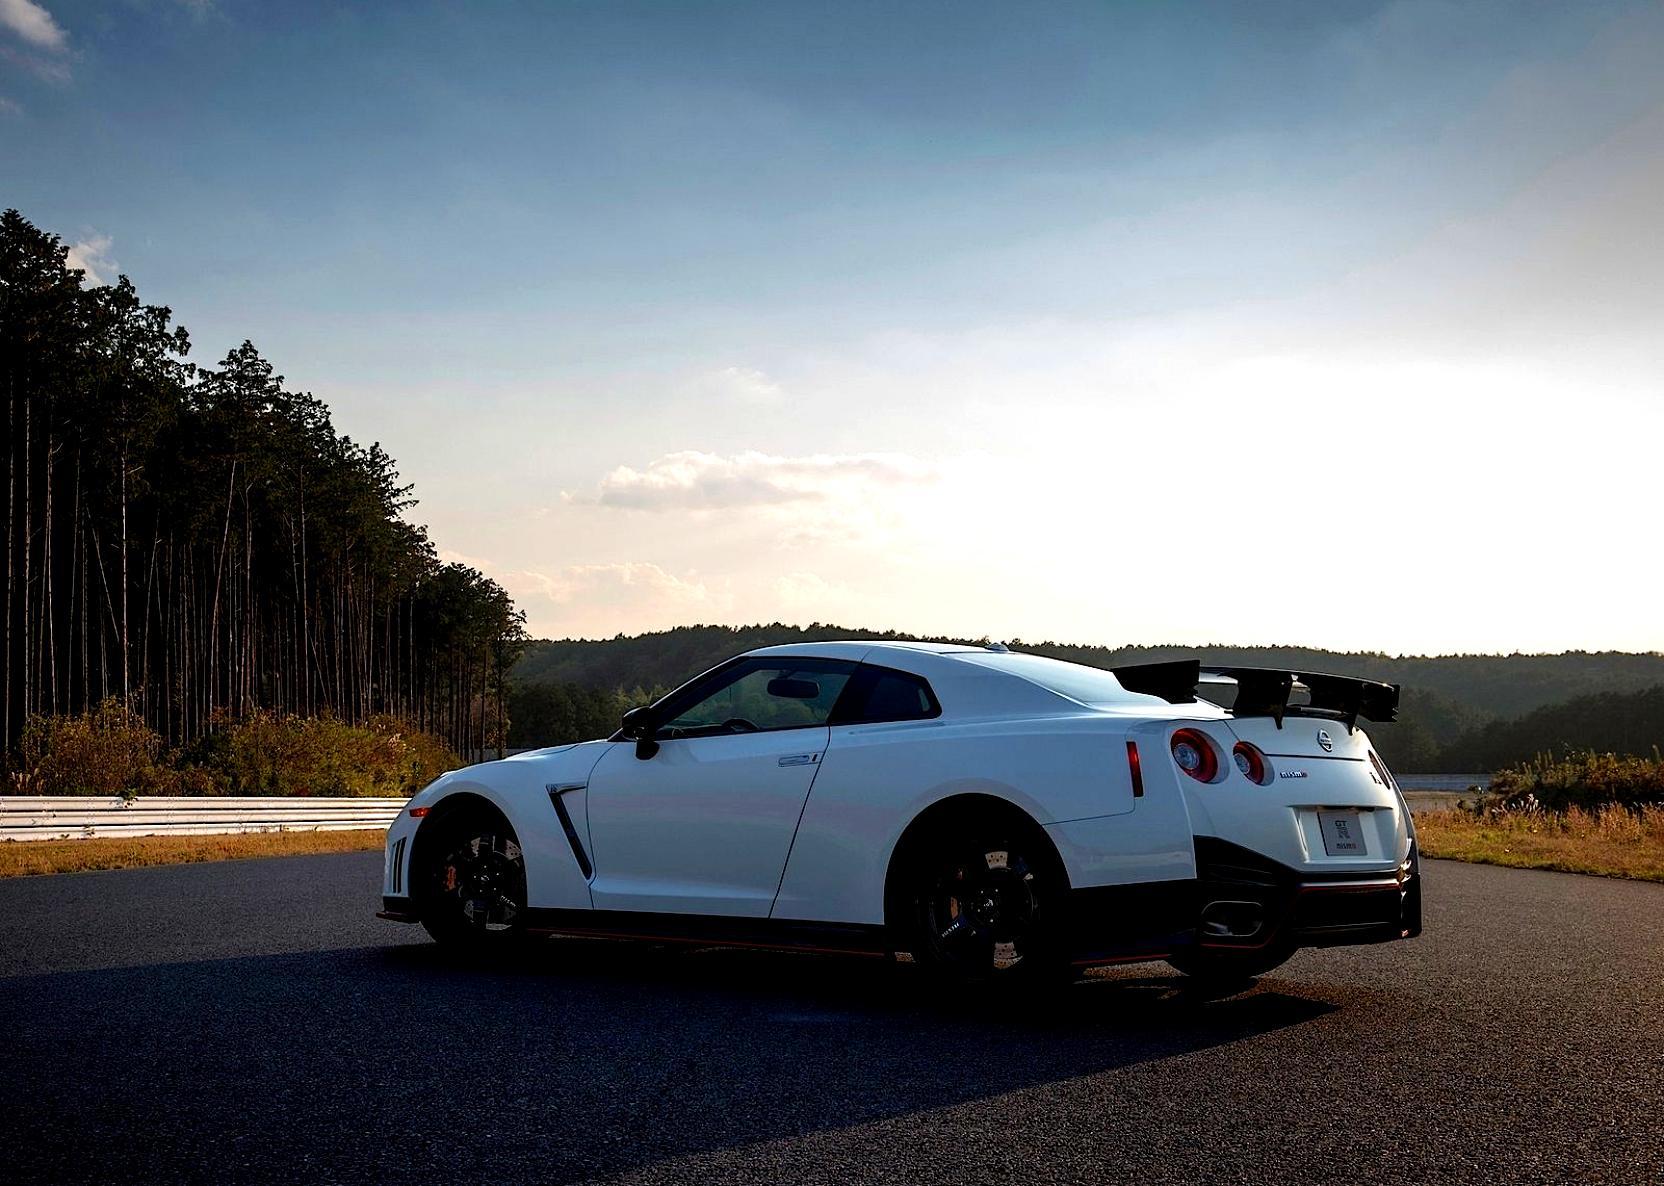 2014 Nissan Juke Tire Size >> Nissan GT-R R35 Nismo 2014 on MotoImg.com